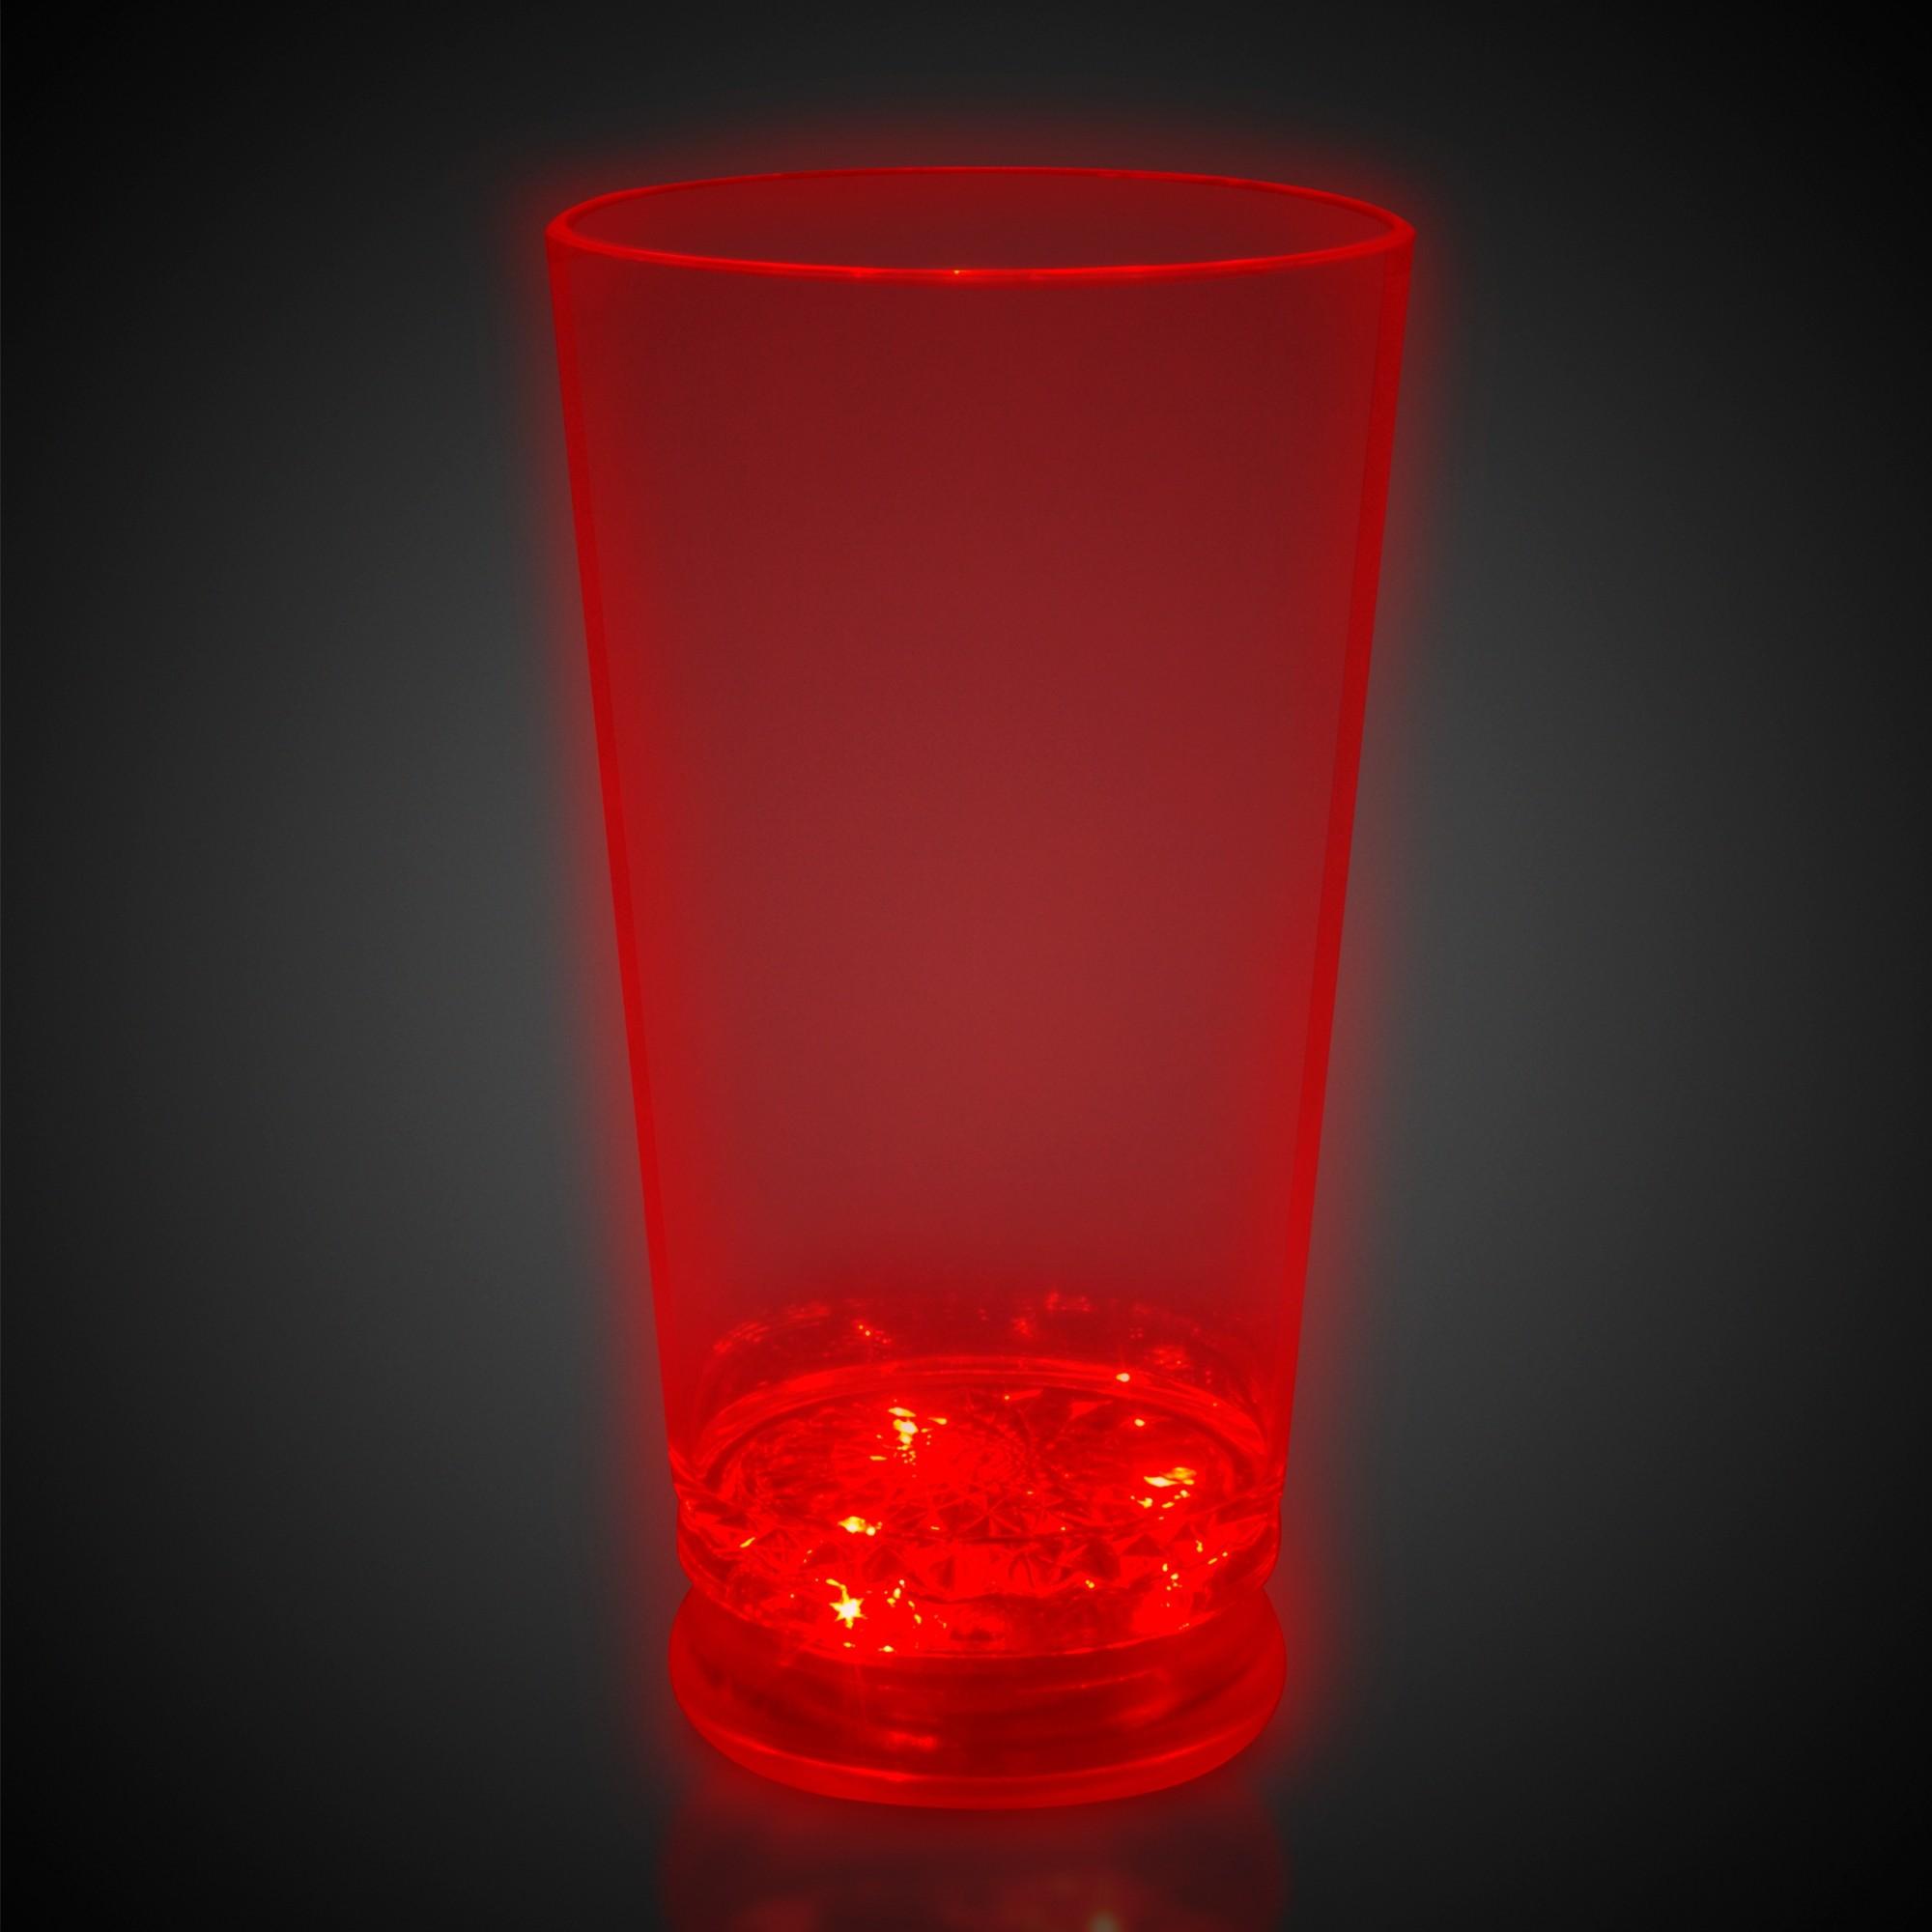 LIGHT-UP PINT GLASS WRED BASE